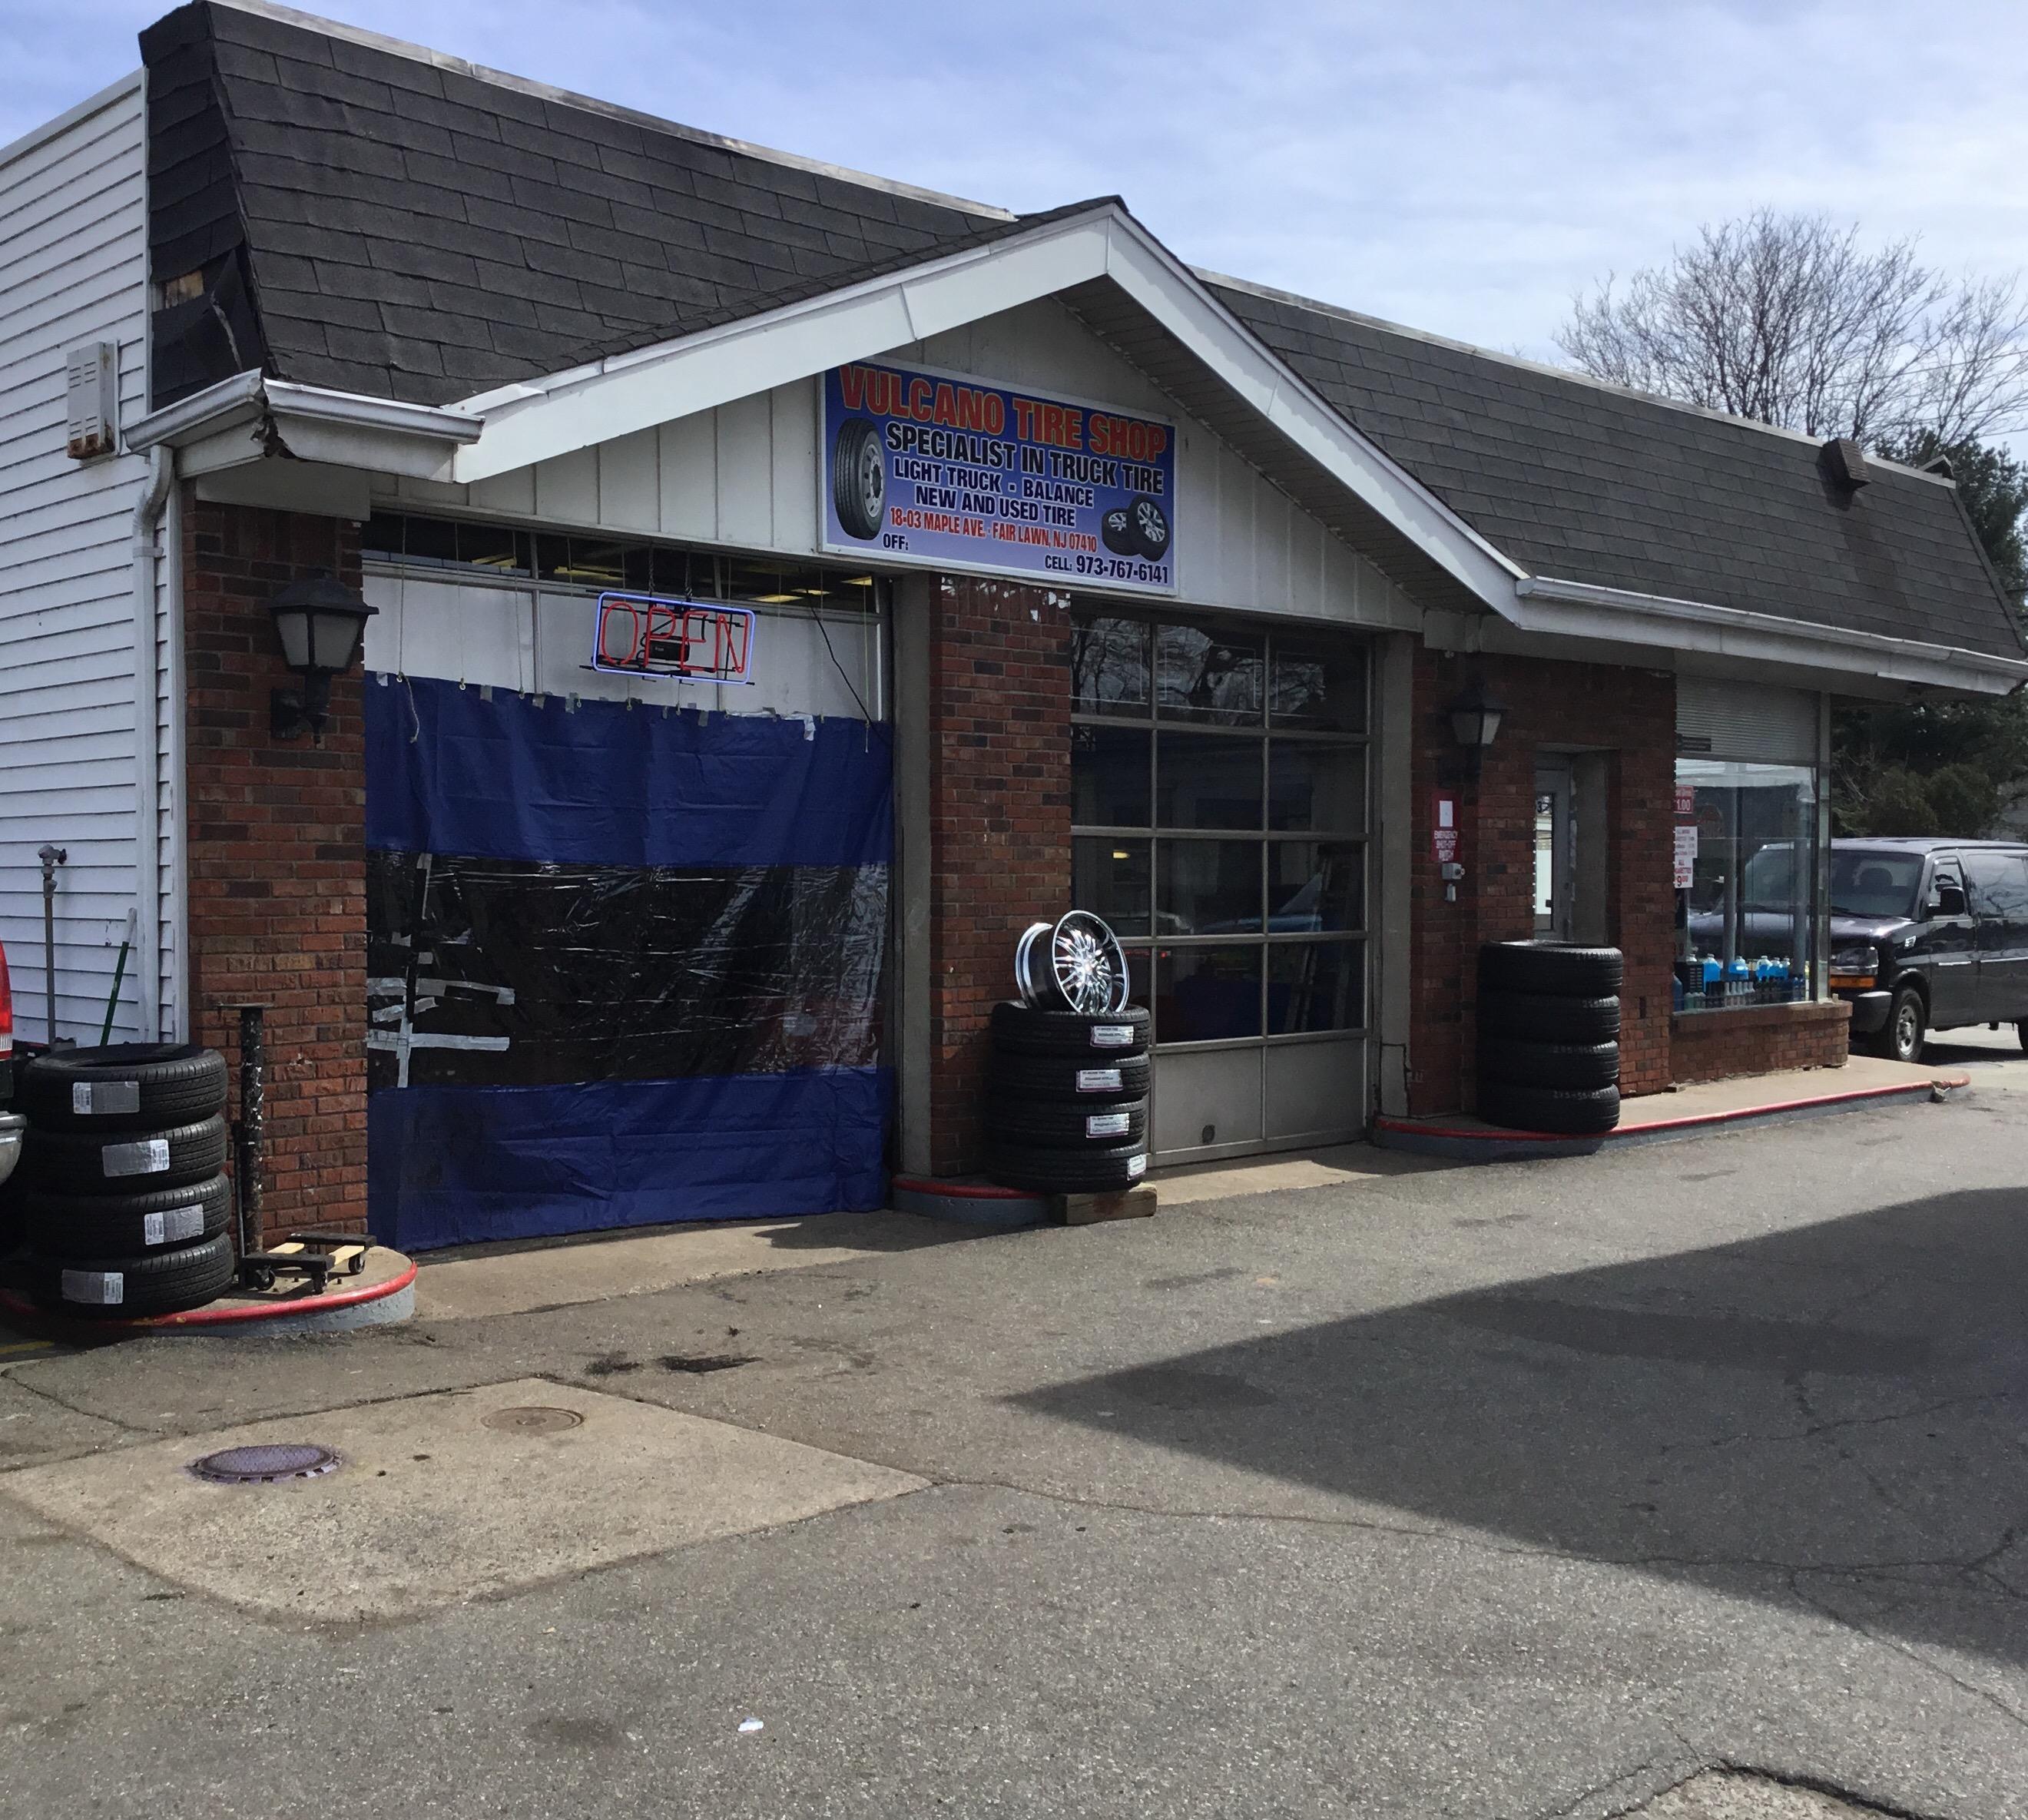 Vulcano Tire Shop image 0